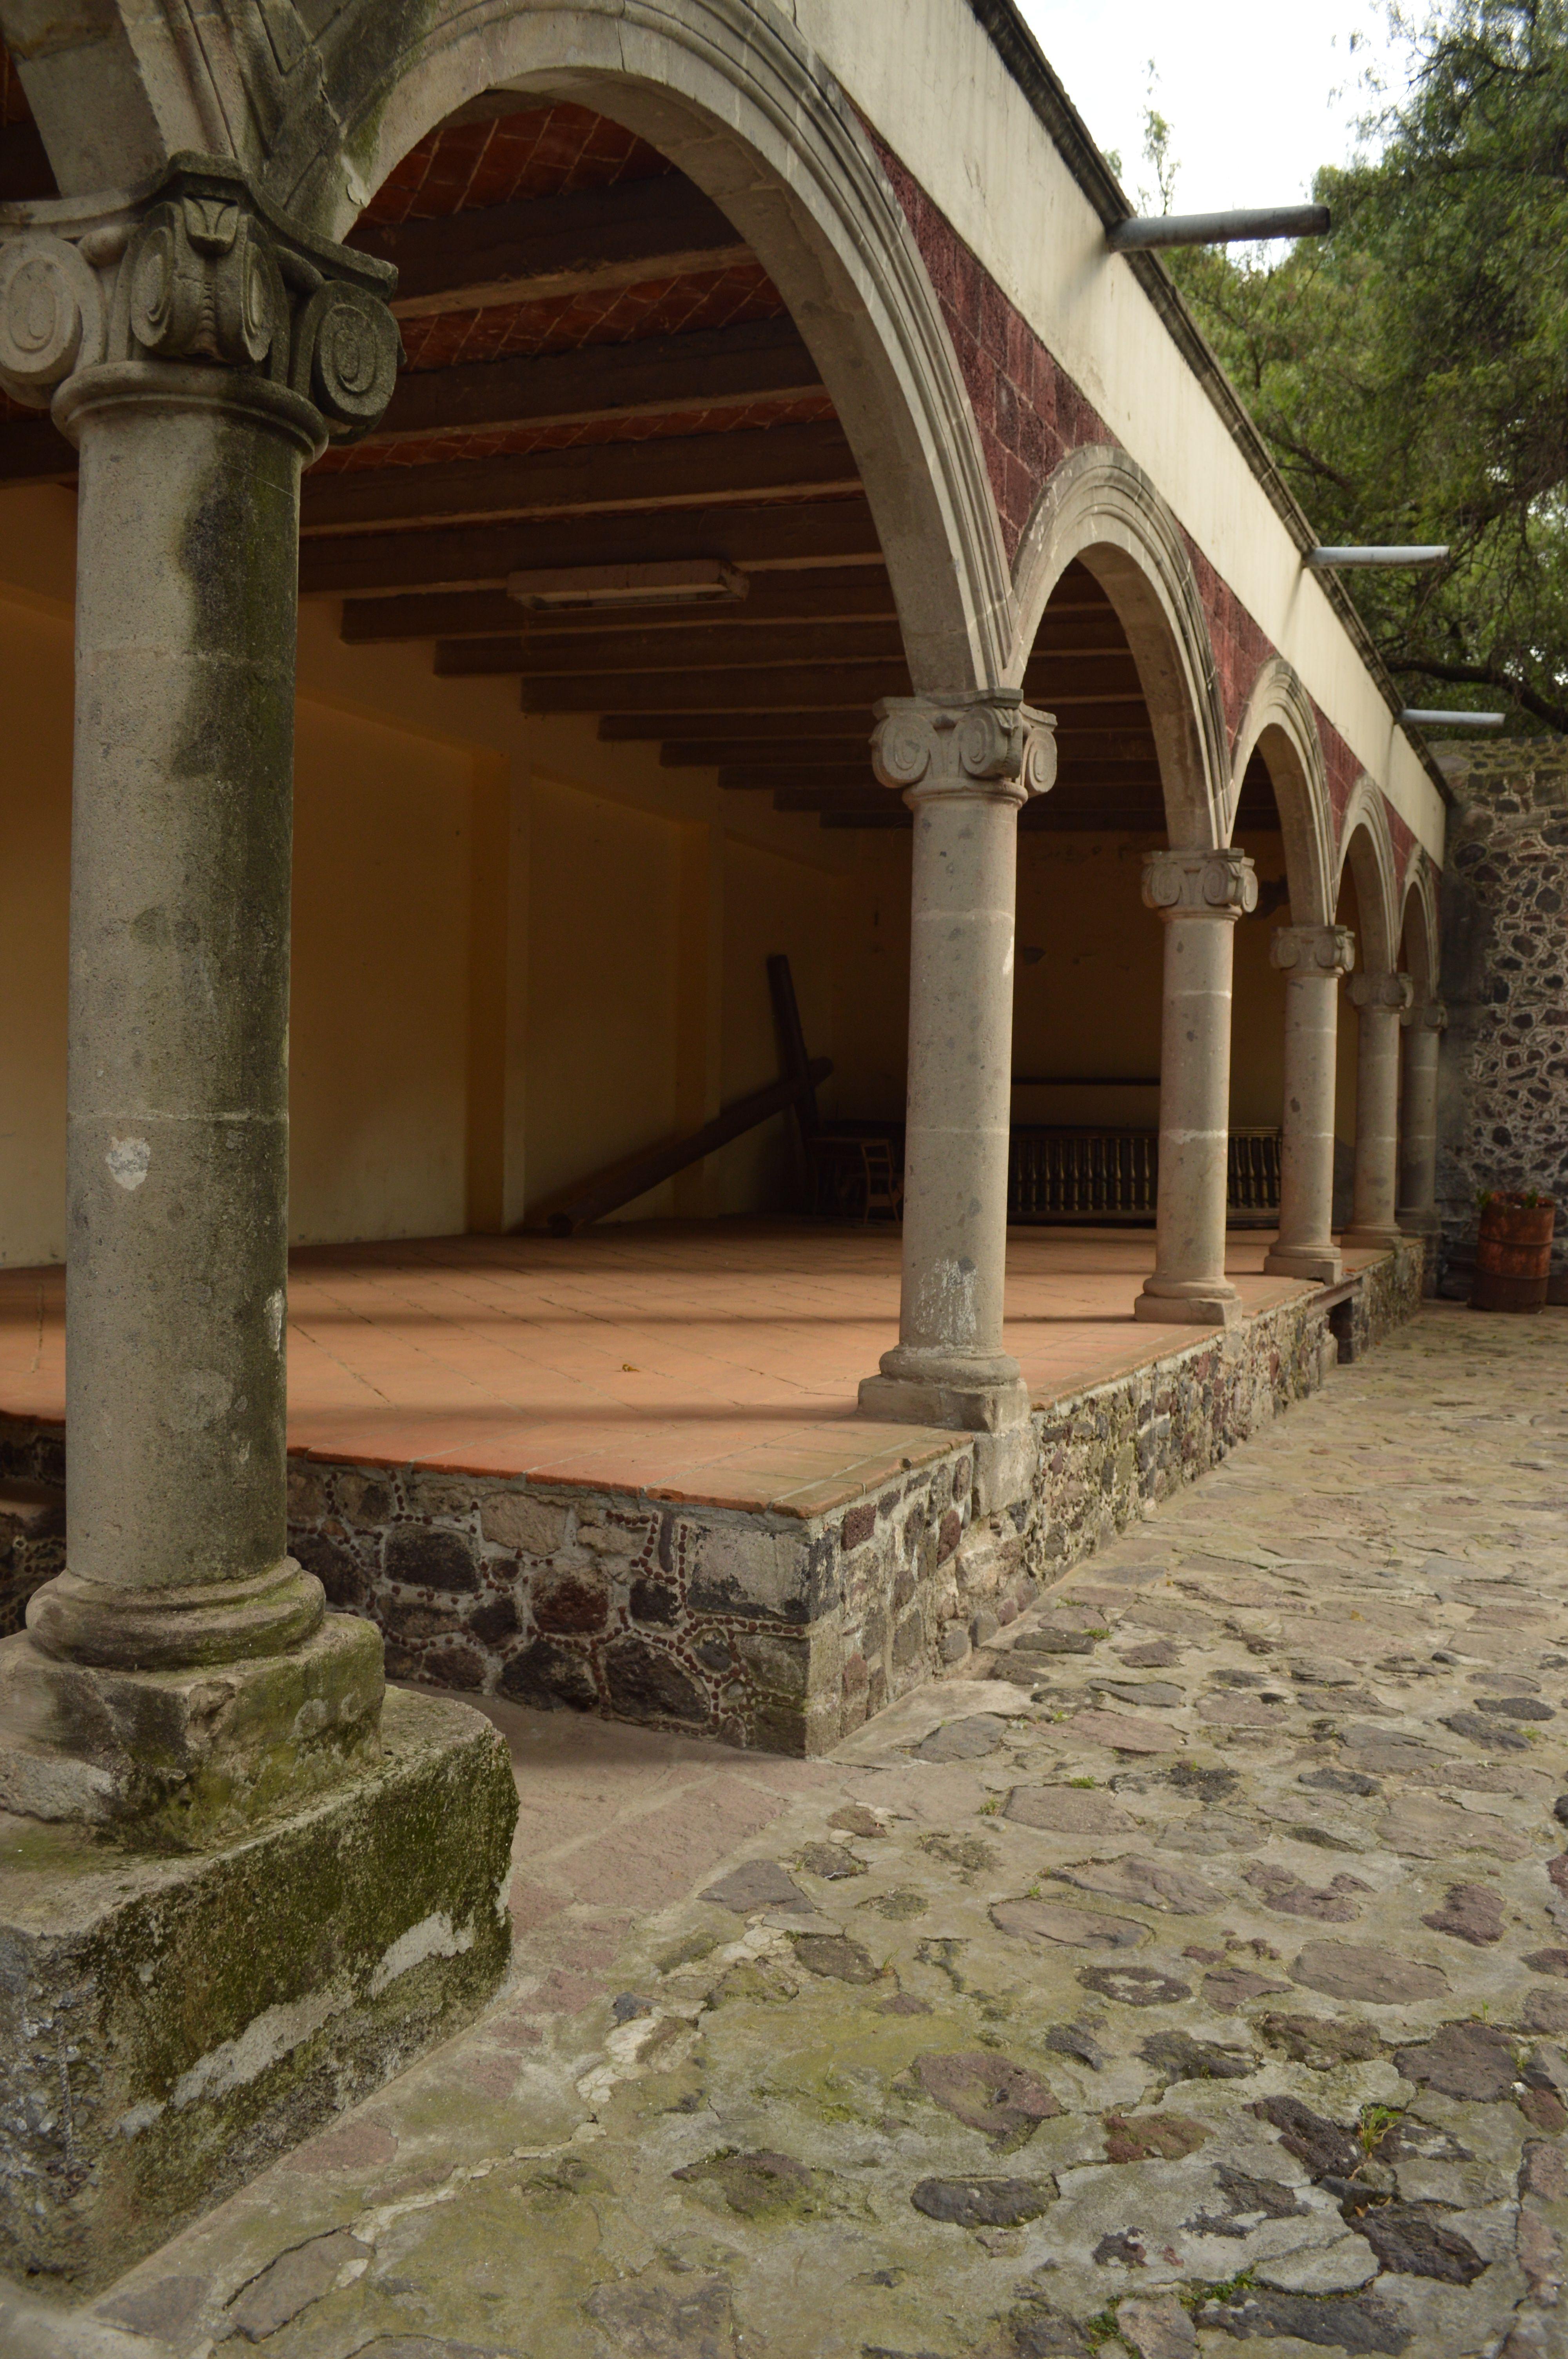 San Juan de las piedritas. Por Téllez Castillo Itzel Alejandra. Fecha 15/10/16. Vo. 1/160 f.5.3 ISO-200